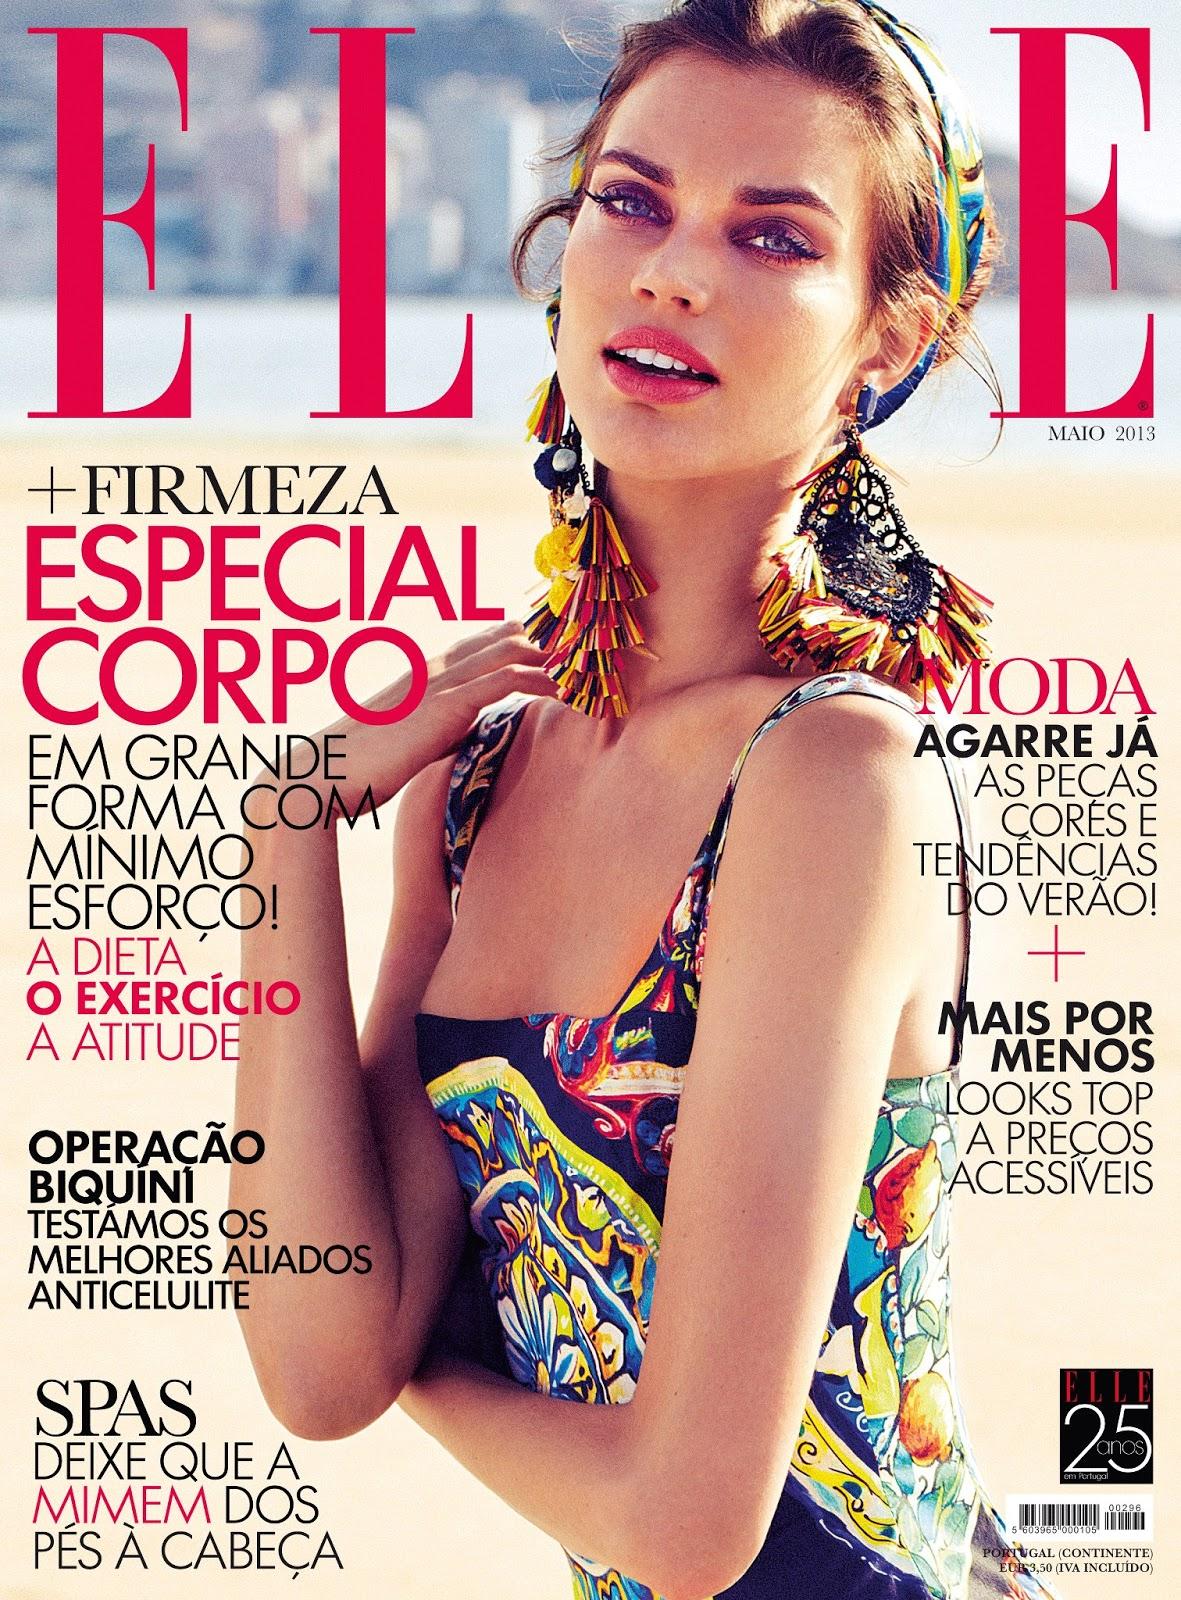 http://3.bp.blogspot.com/-gNM00VhdjY4/UWartq2oooI/AAAAAAABPY8/DEkdIDRHgtI/s1600/Elle-Portugal-April-2013-Rianne-ten-Haken-Magazine-Cover.jpg